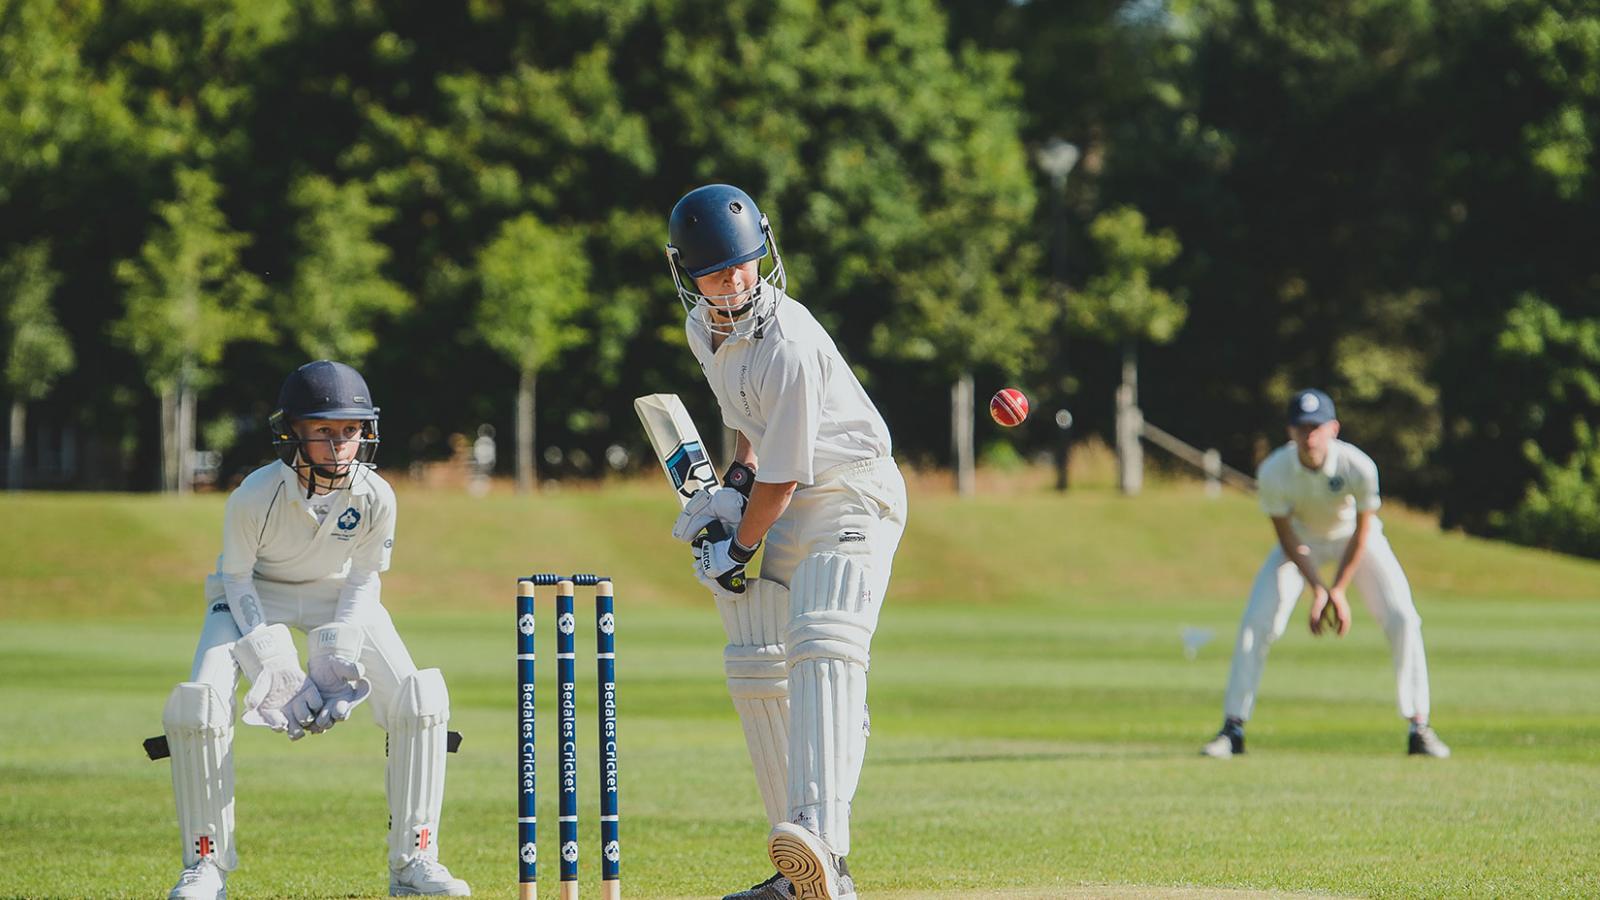 Dunhurst pupils playing cricket